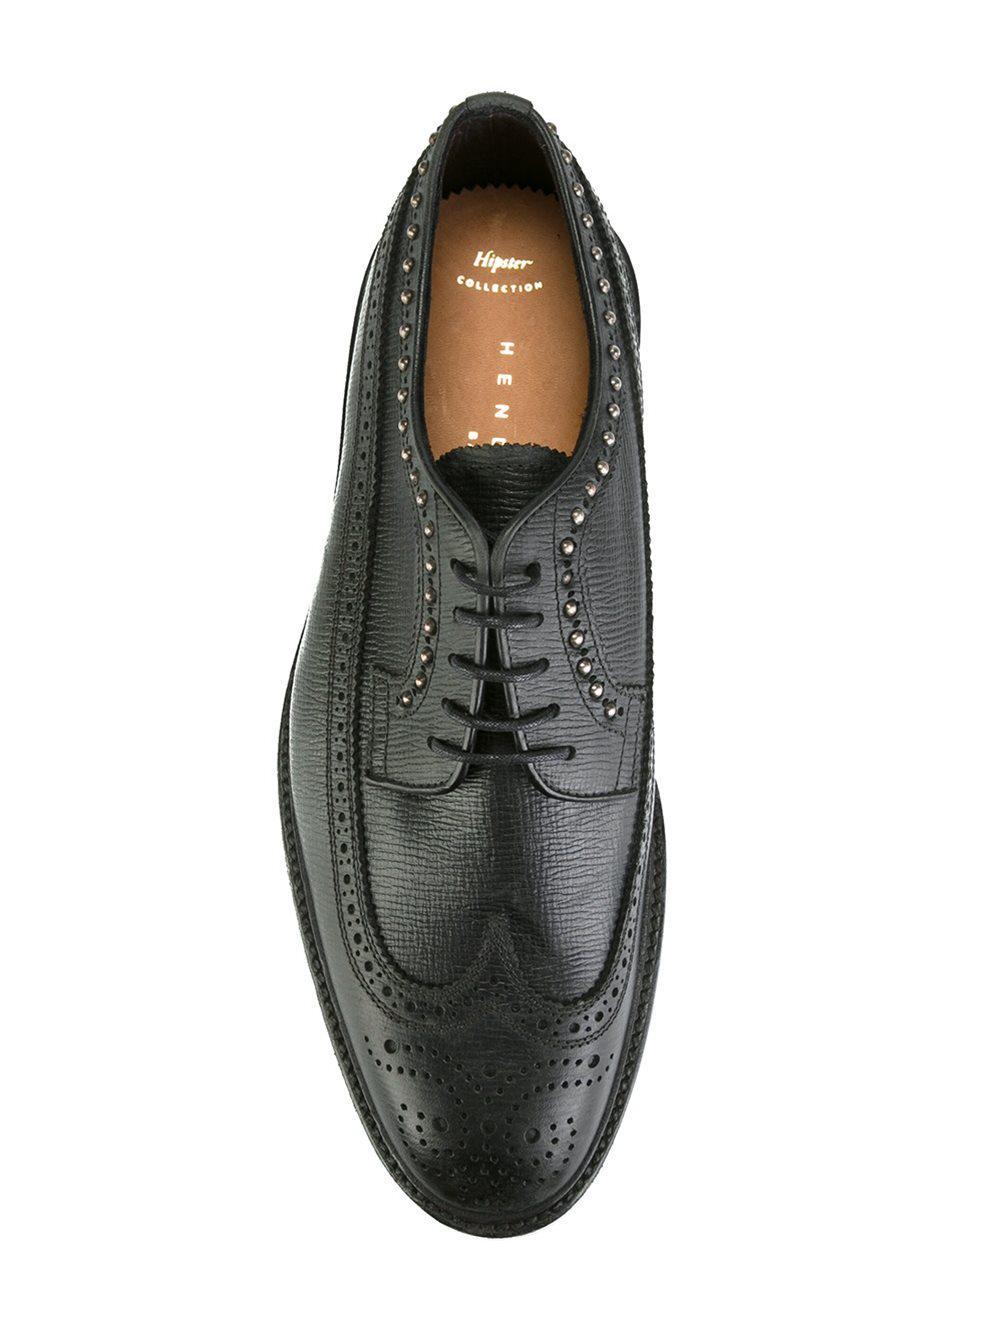 studded Derby shoes - Black Henderson Baracco ar6vU2